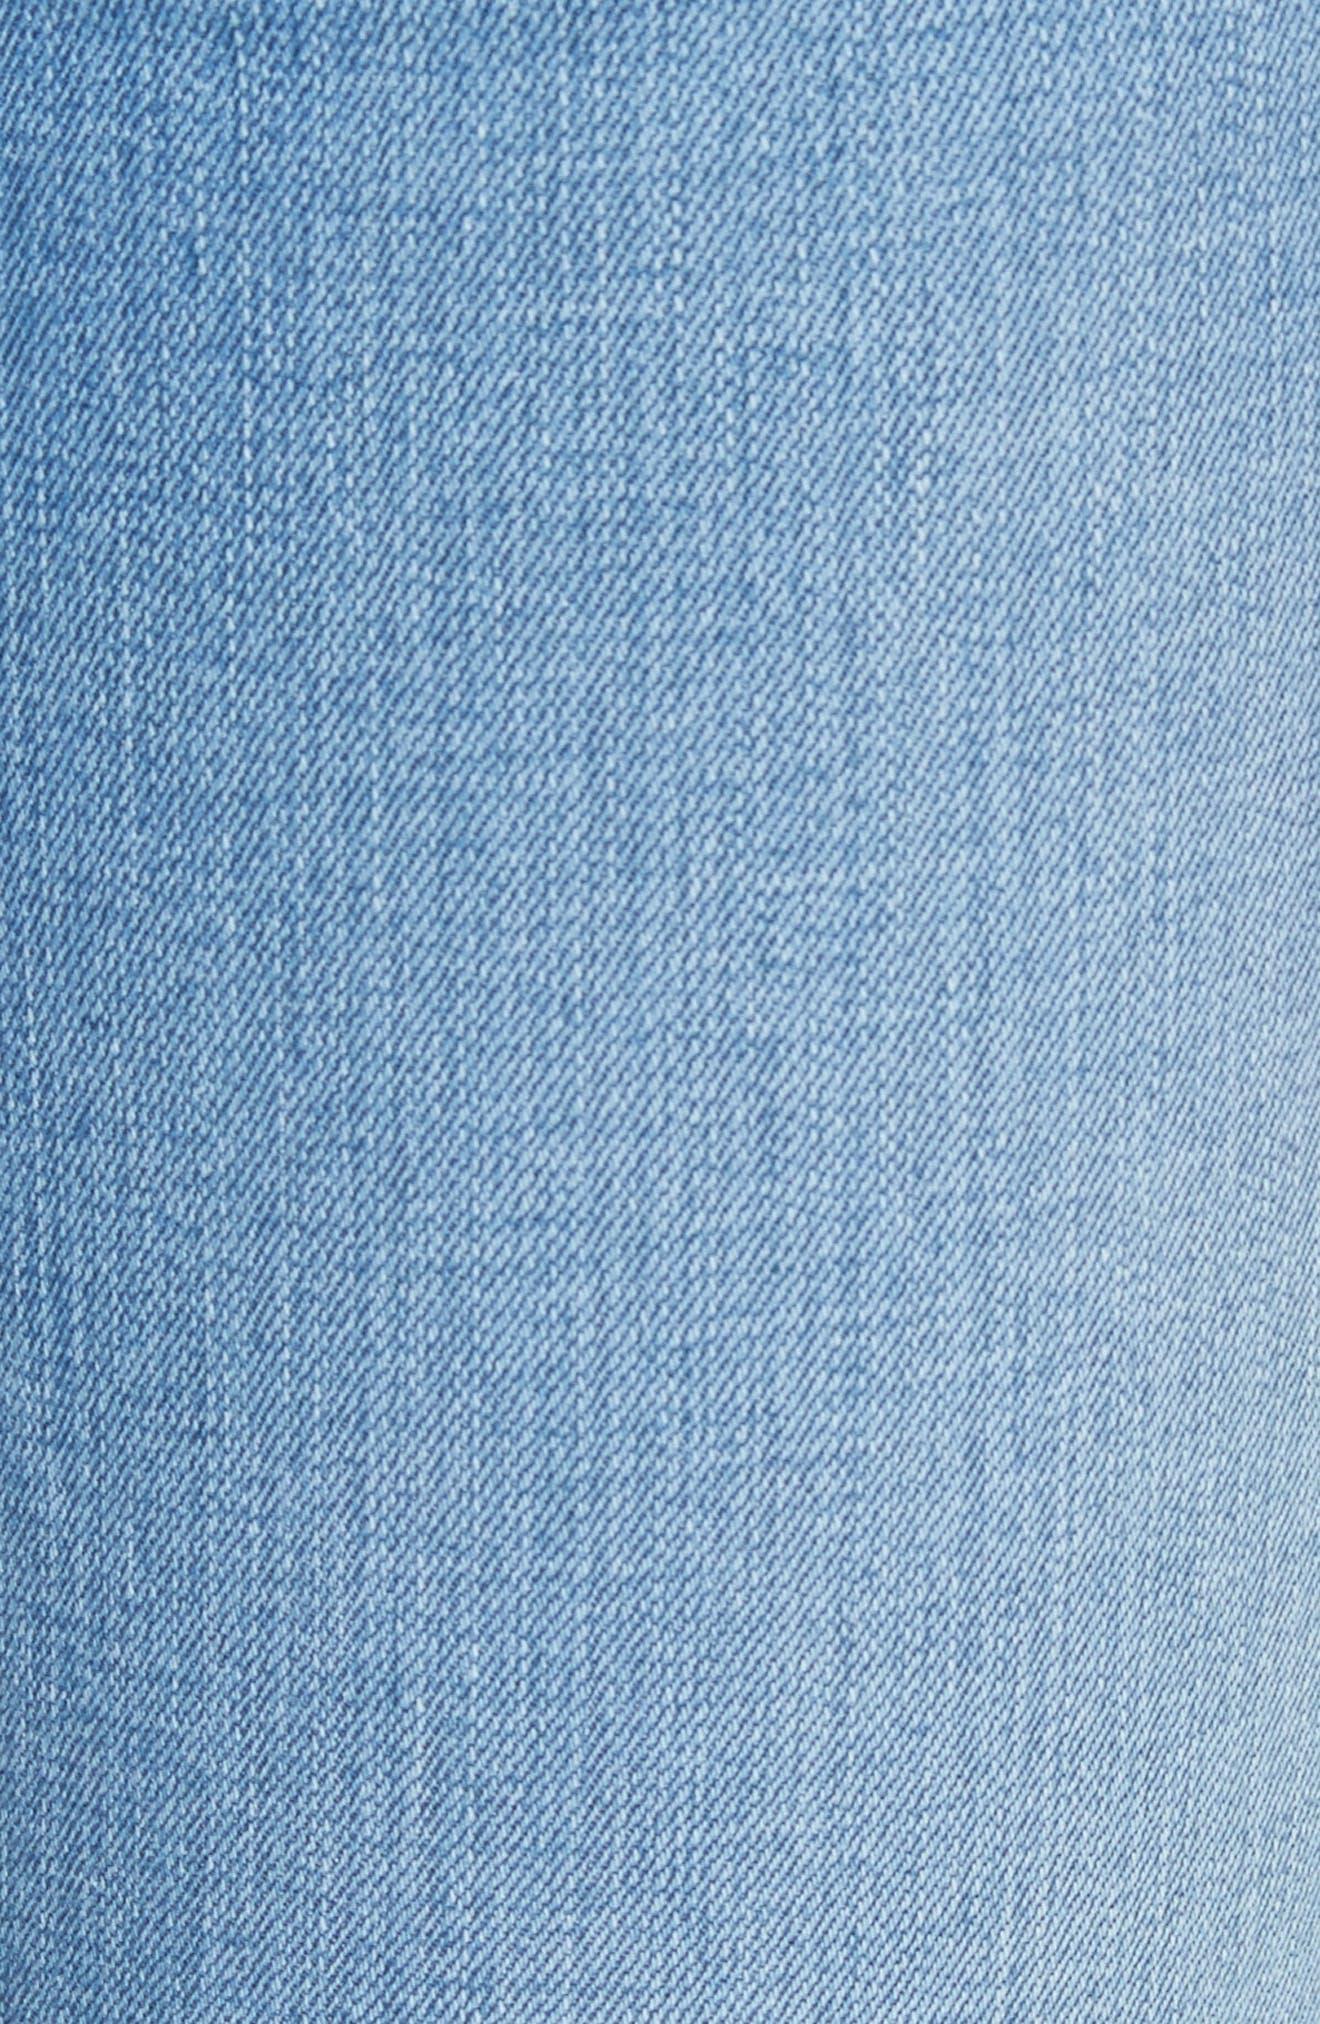 Raw Hem Capri Skinny Jeans,                             Alternate thumbnail 5, color,                             Levee